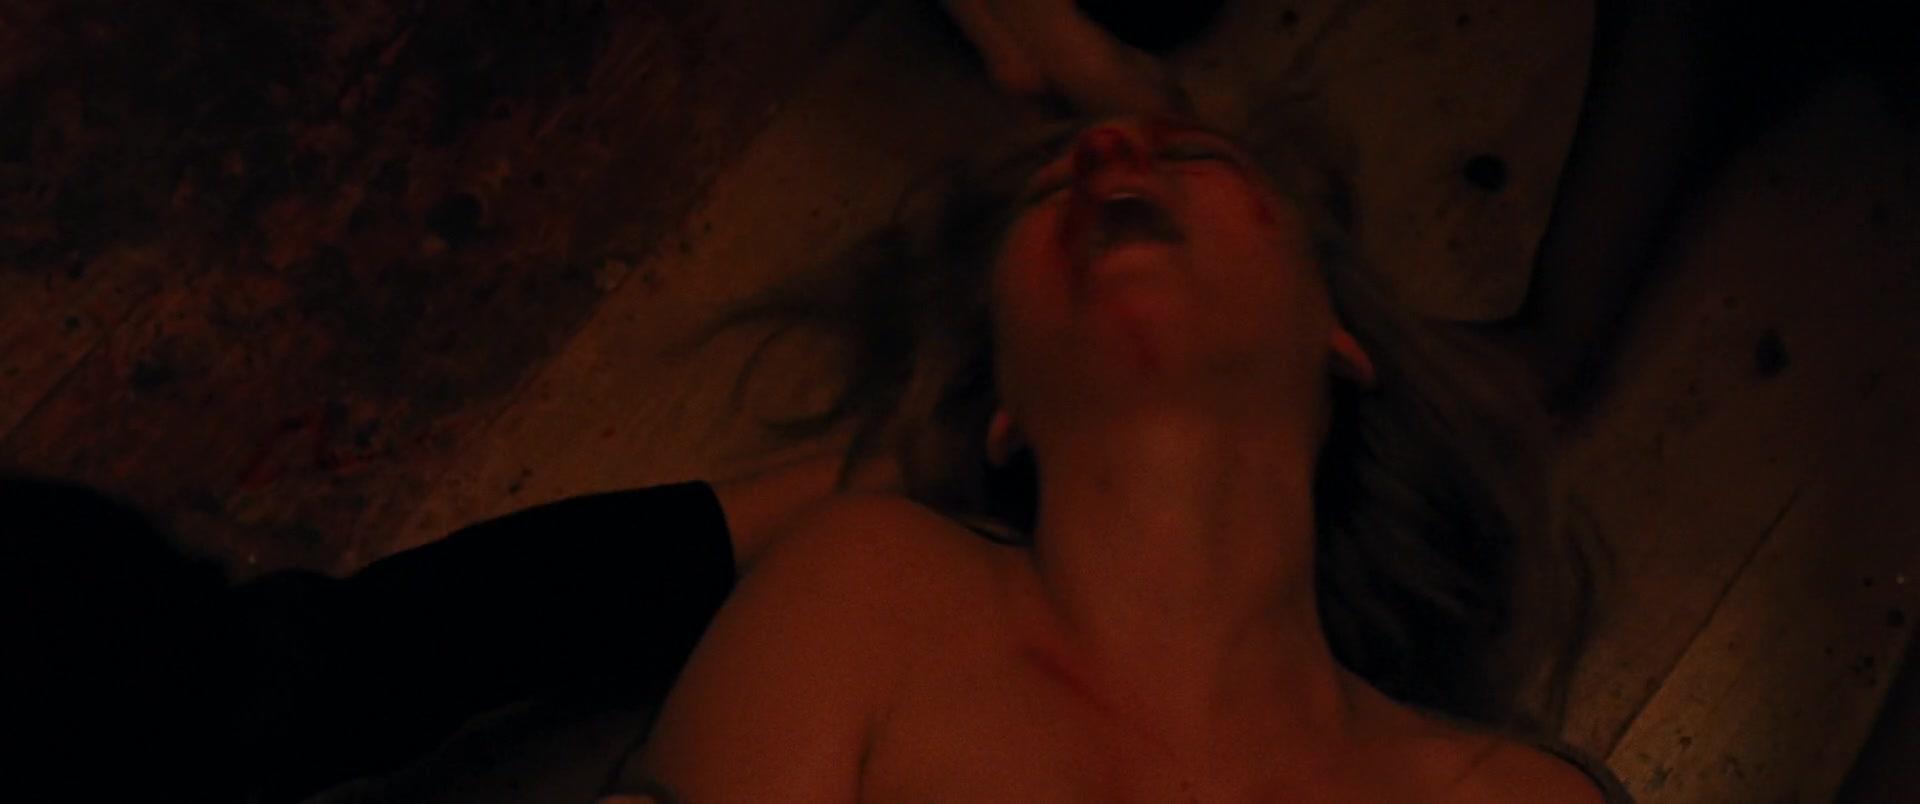 Jennifer-Lawrence-Michelle-Pfeiffer-Mother-43-thefappeningblog.com_.jpg